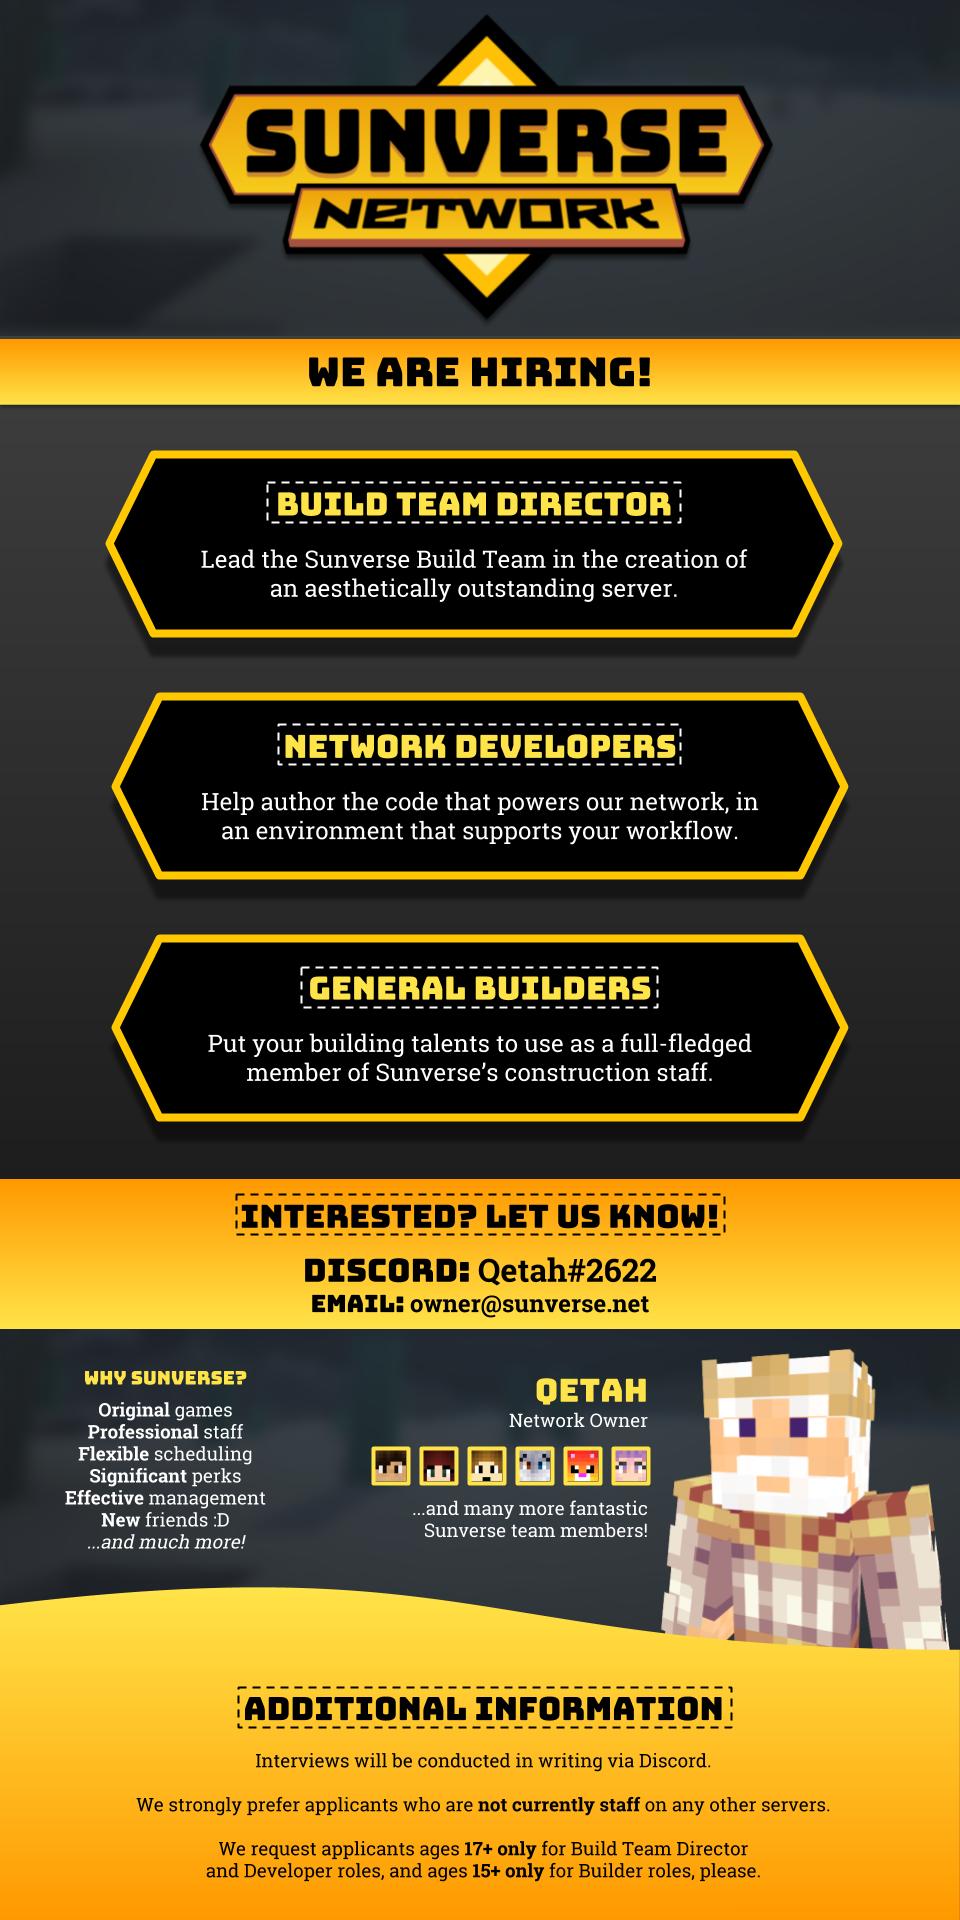 Original Games] SUNVERSE -- hiring motivated Developers